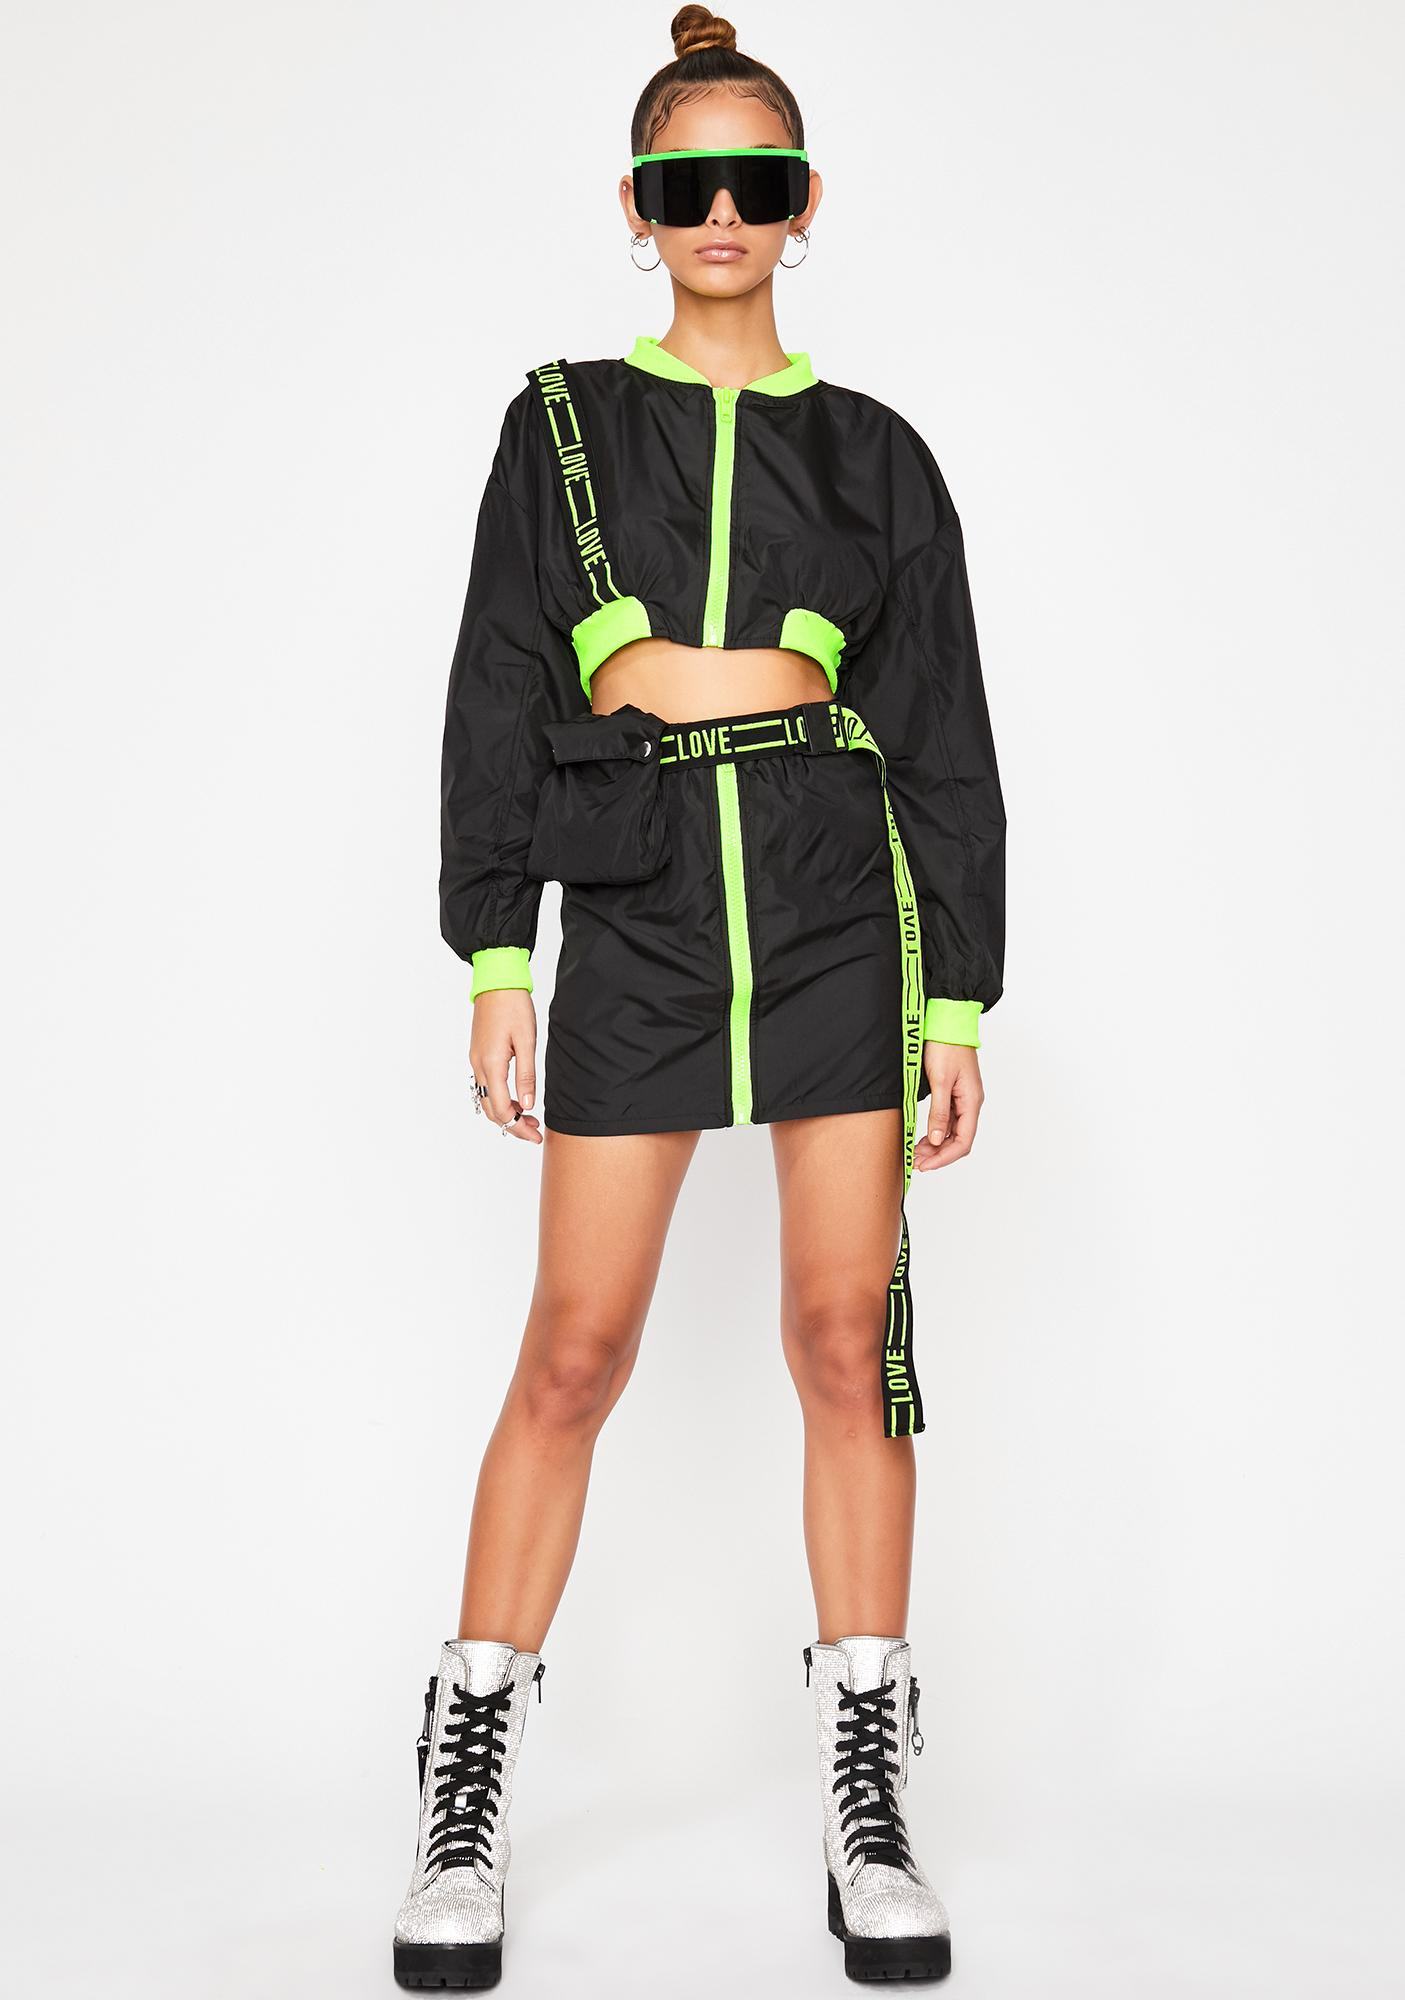 Rave Zone Skirt Set